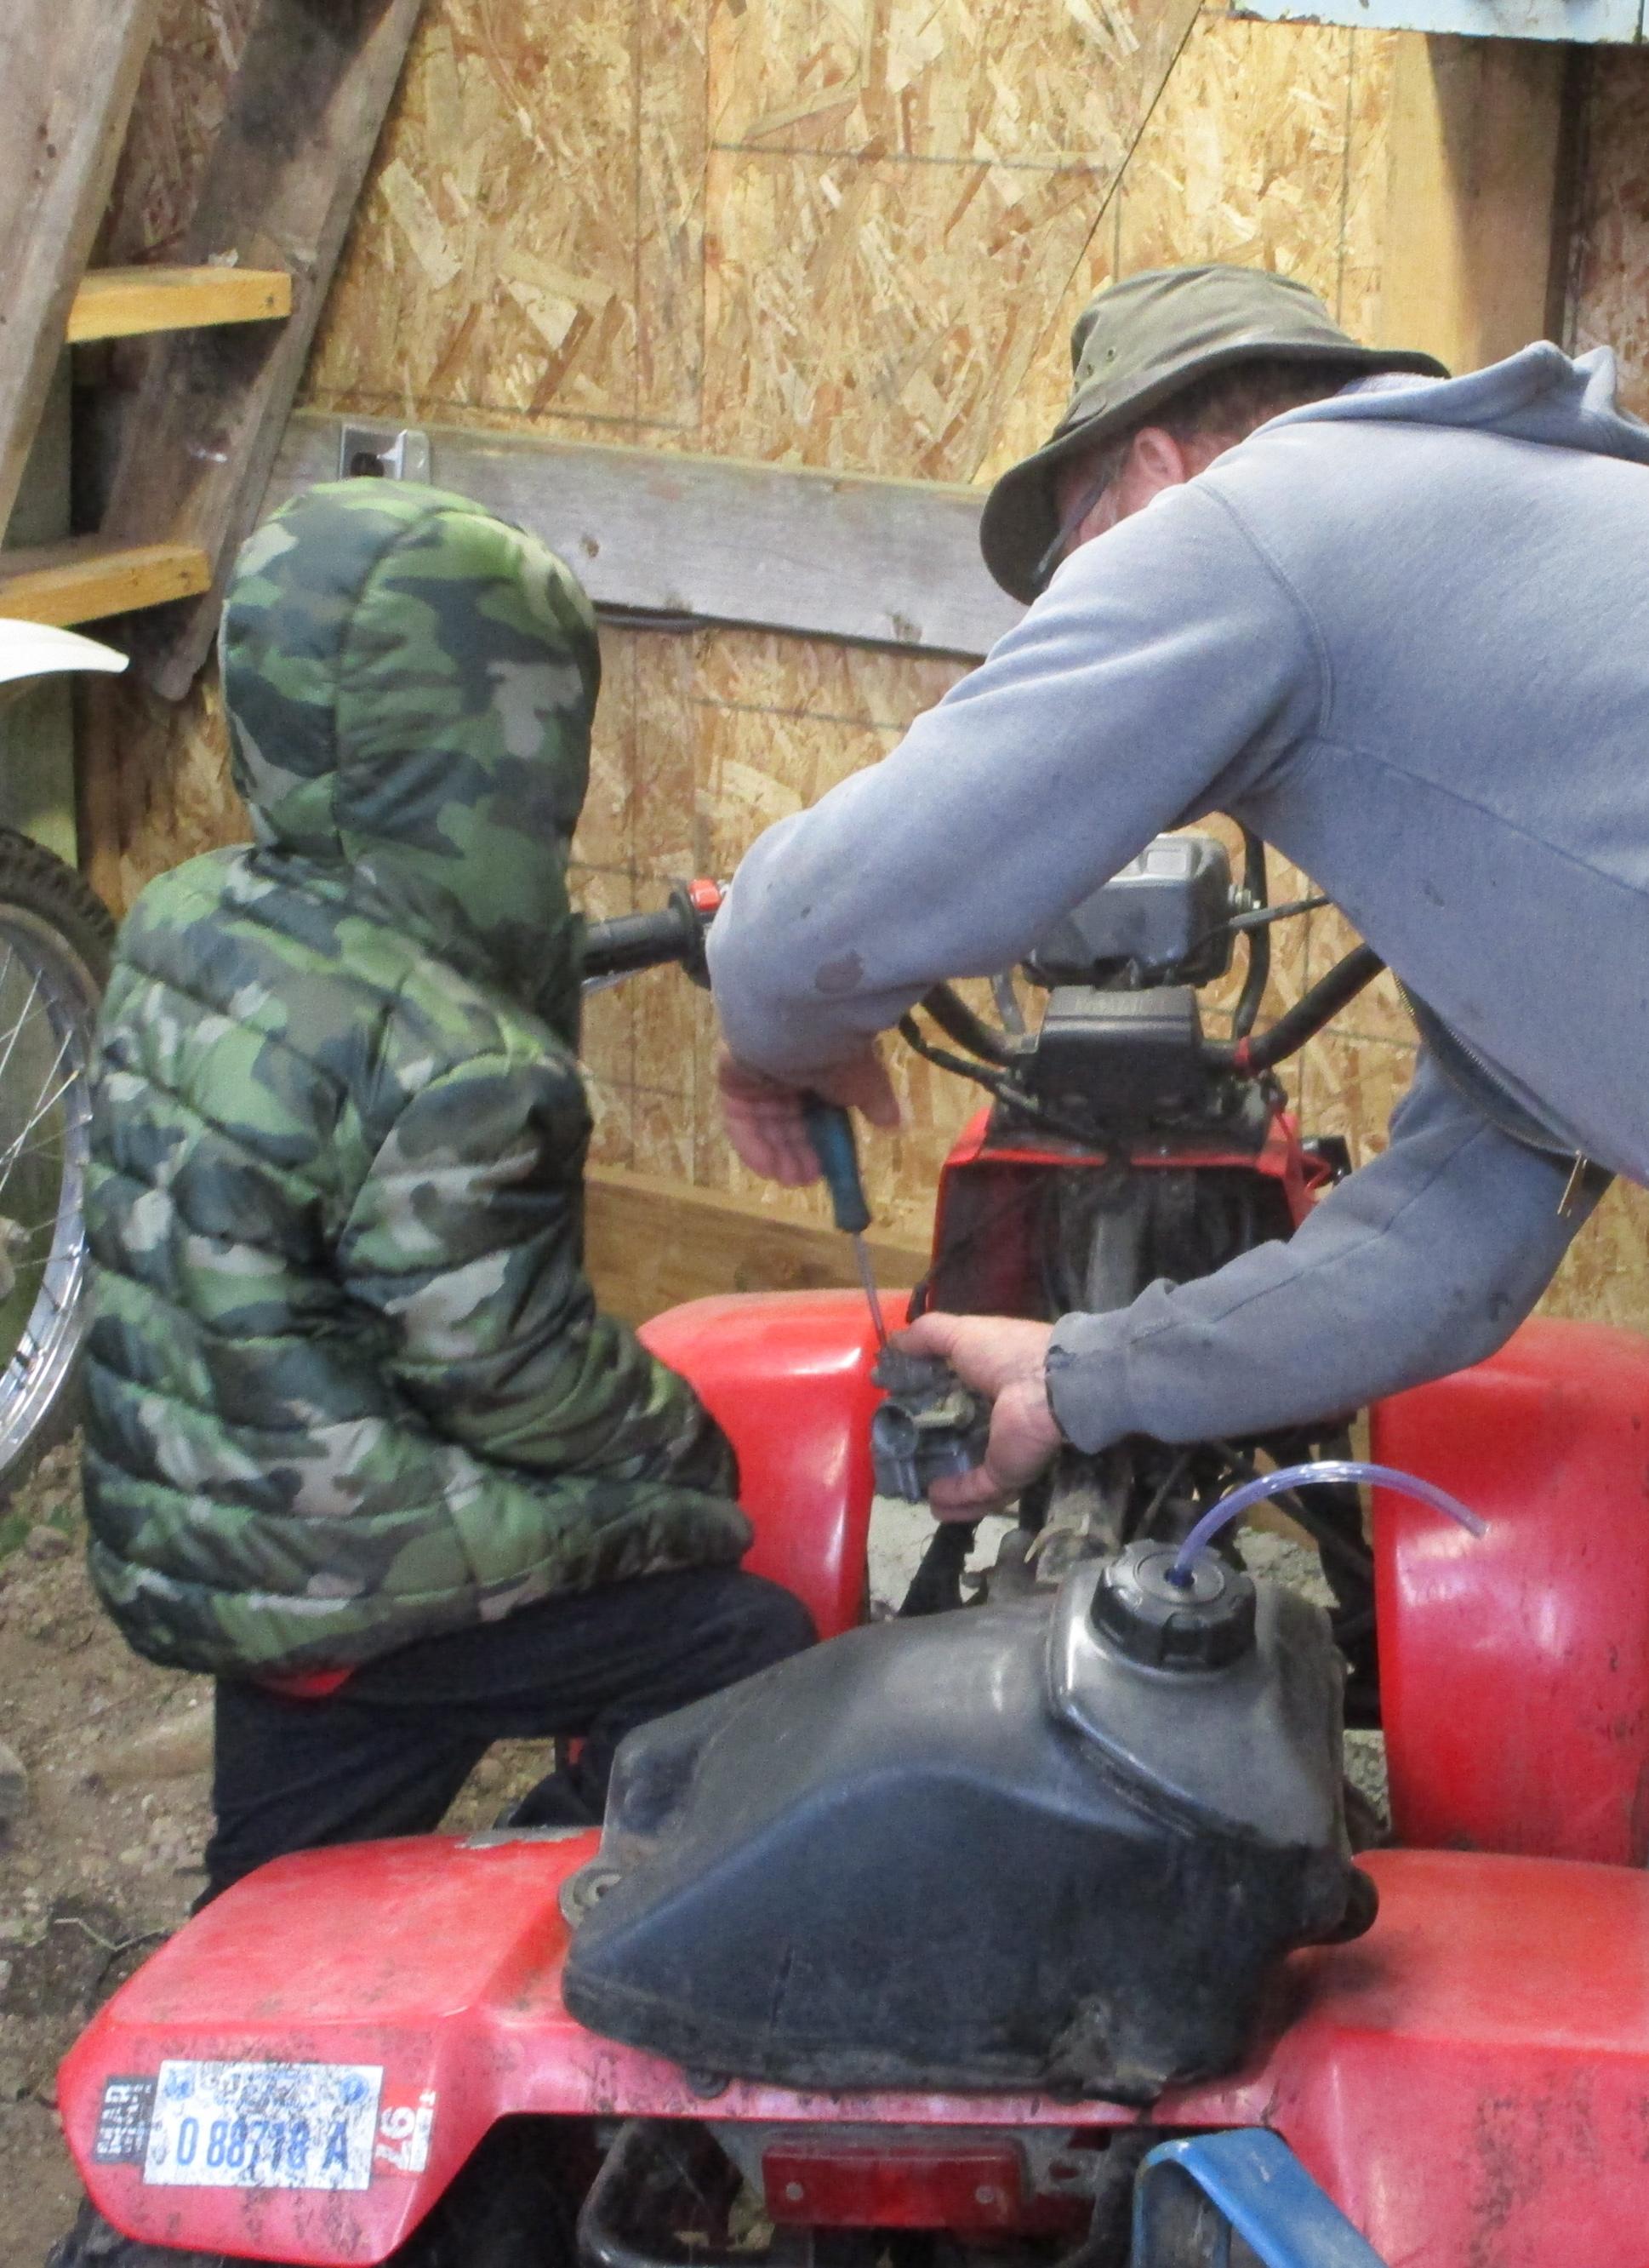 Tom showing William how to repalce quad carburator